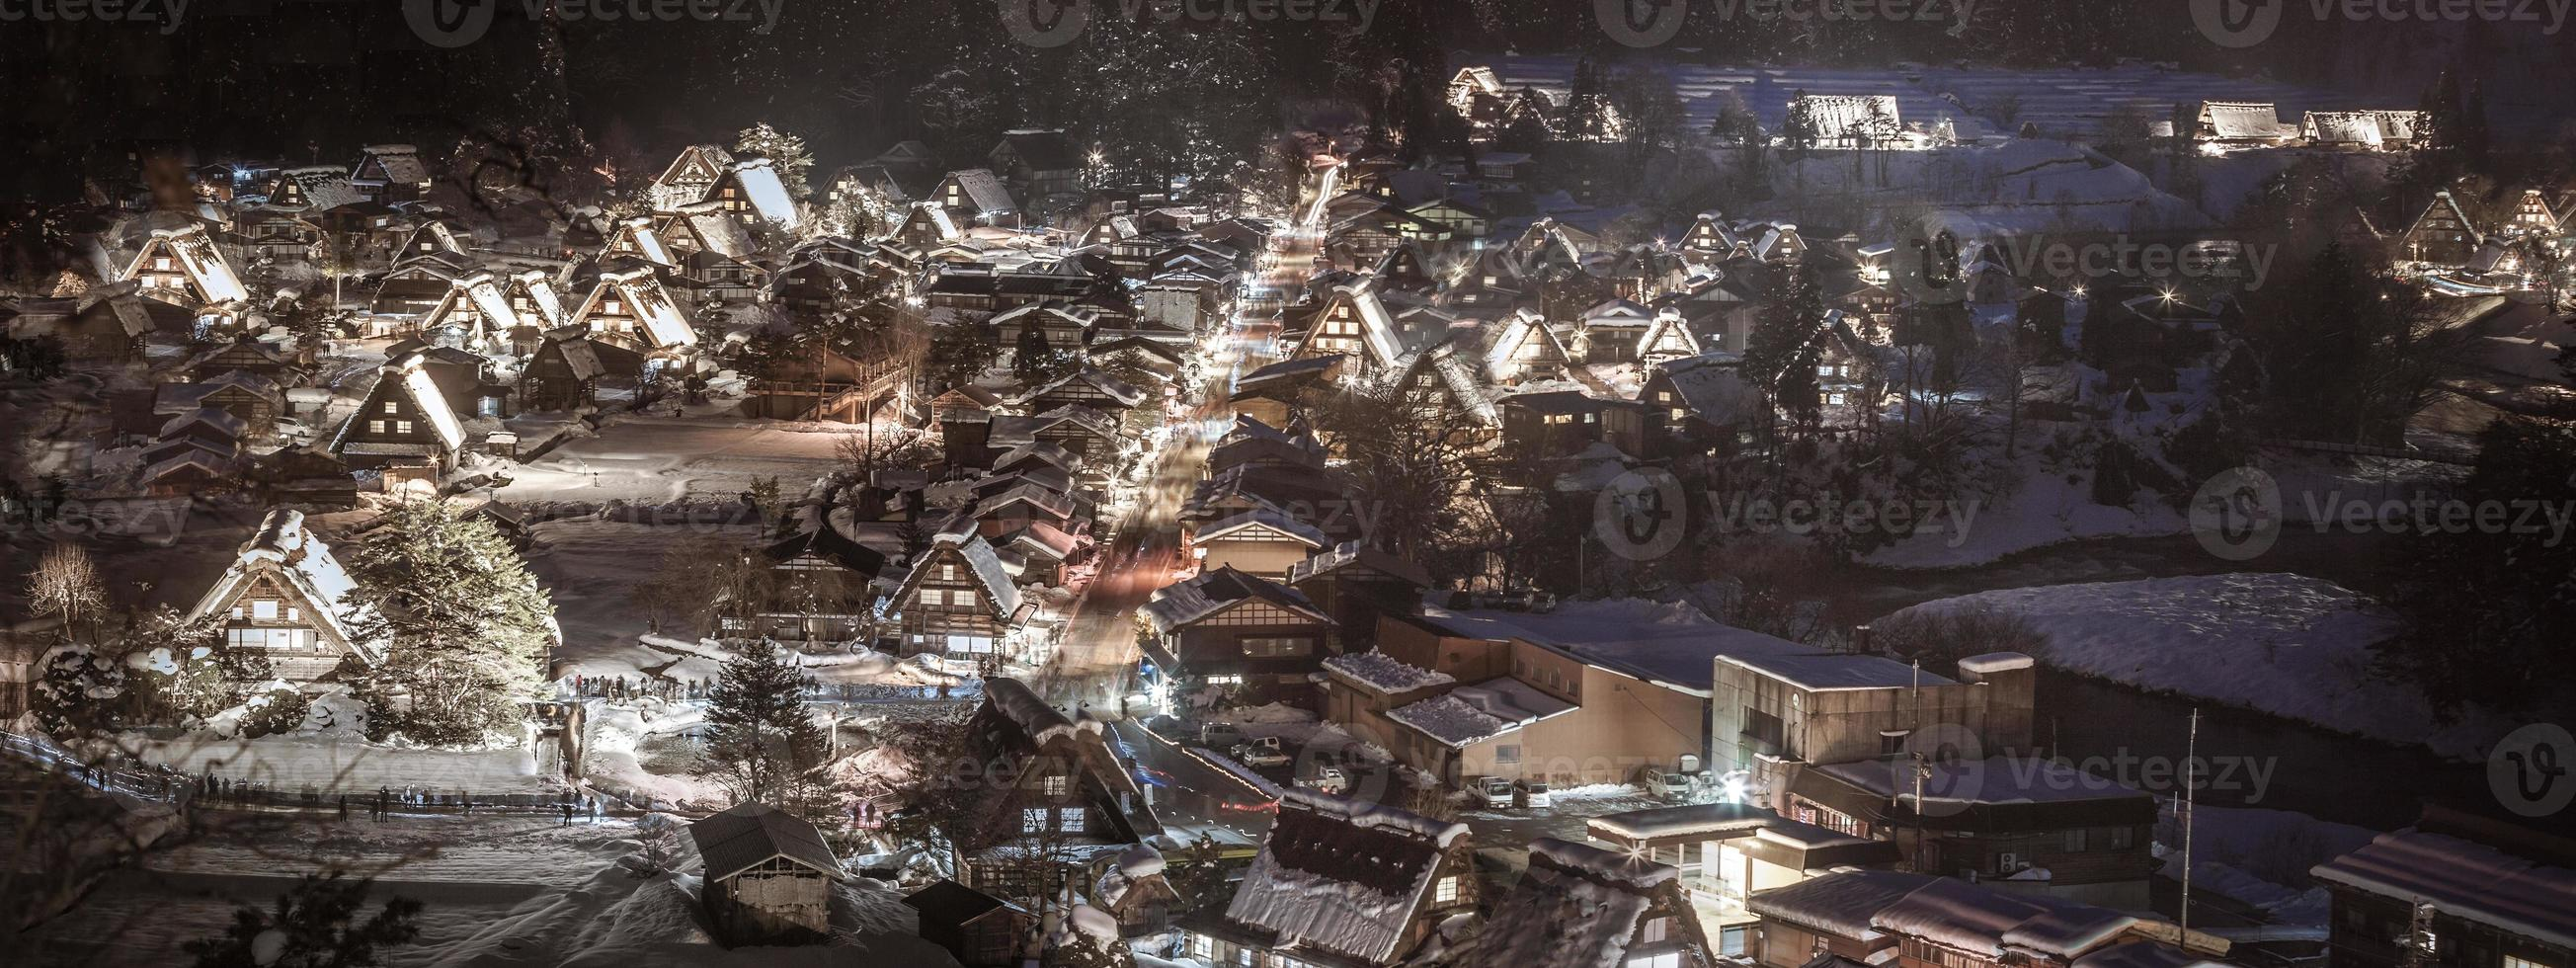 shirakawa-go-light-up invernale foto